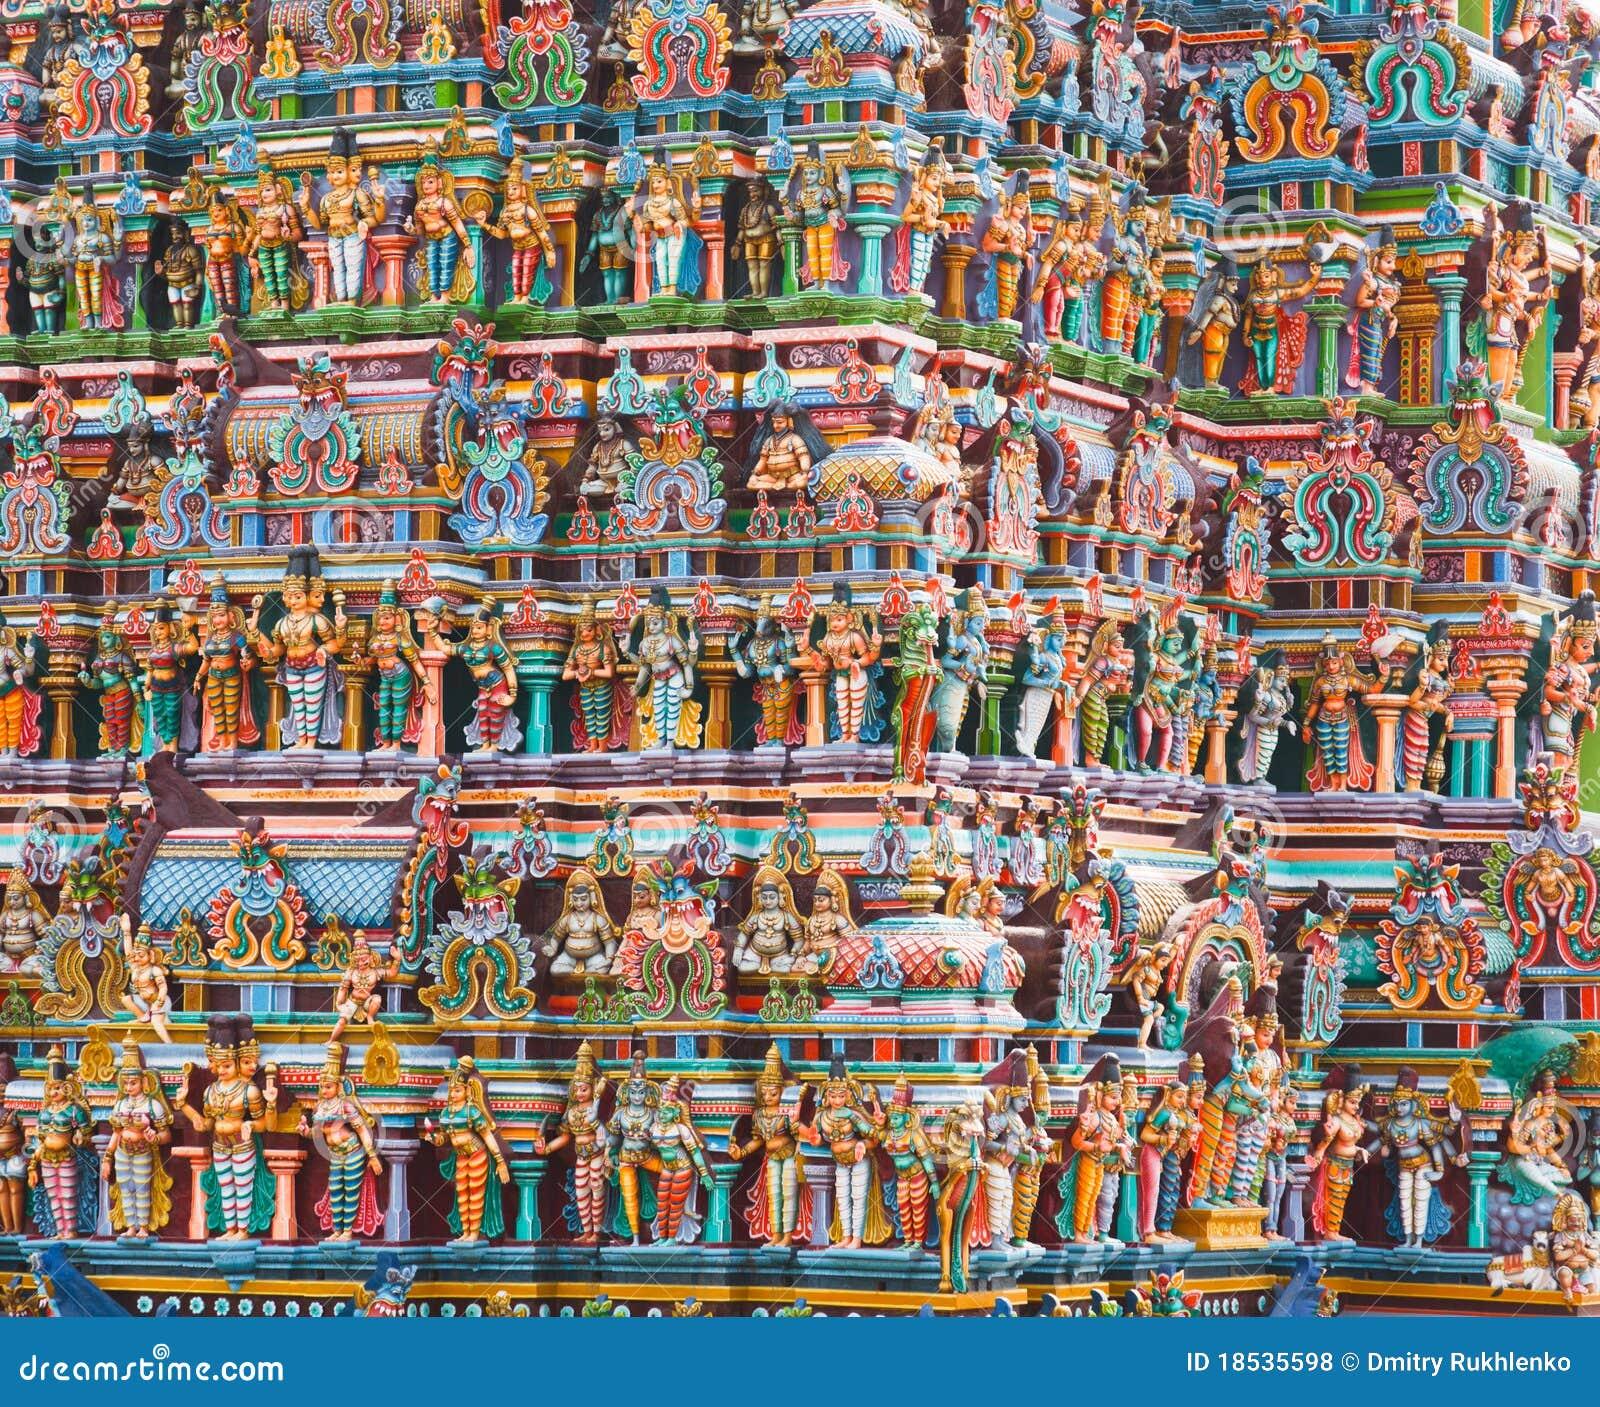 temple tower chennai company list